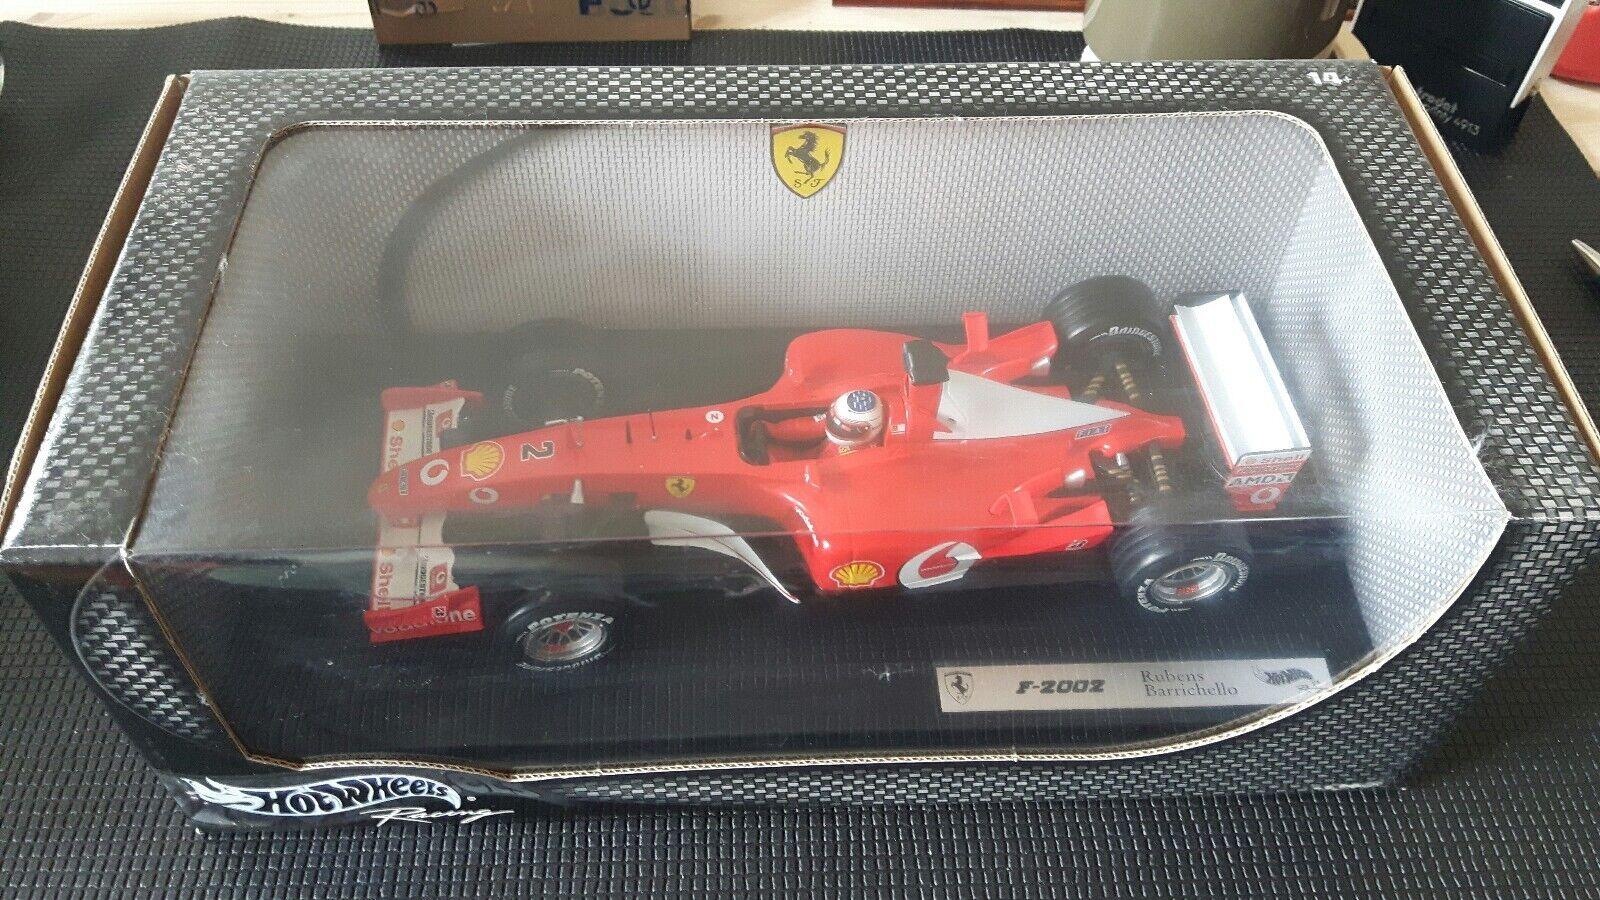 F1 Ferrari F 2002 R. Barrichello 1 18